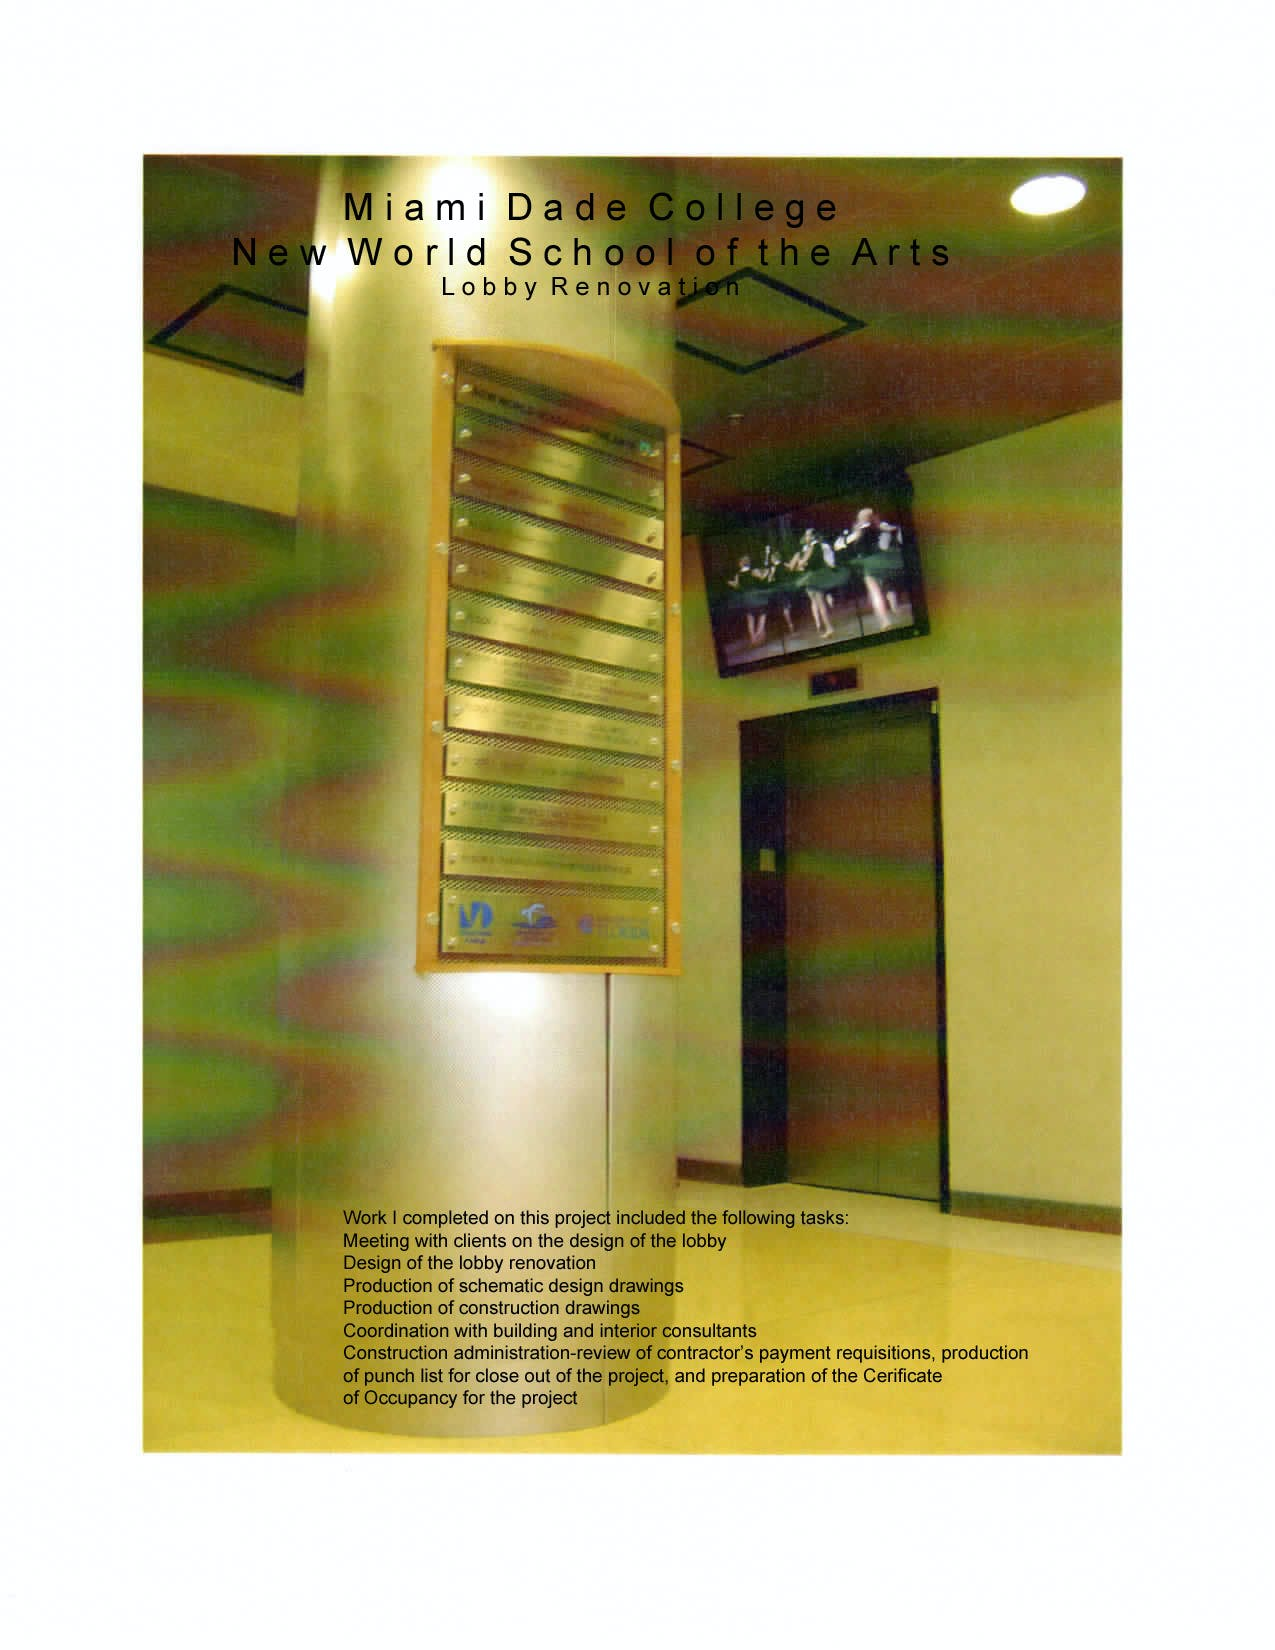 75 interior design courses miami dade college miami dade college culinary institute. Black Bedroom Furniture Sets. Home Design Ideas